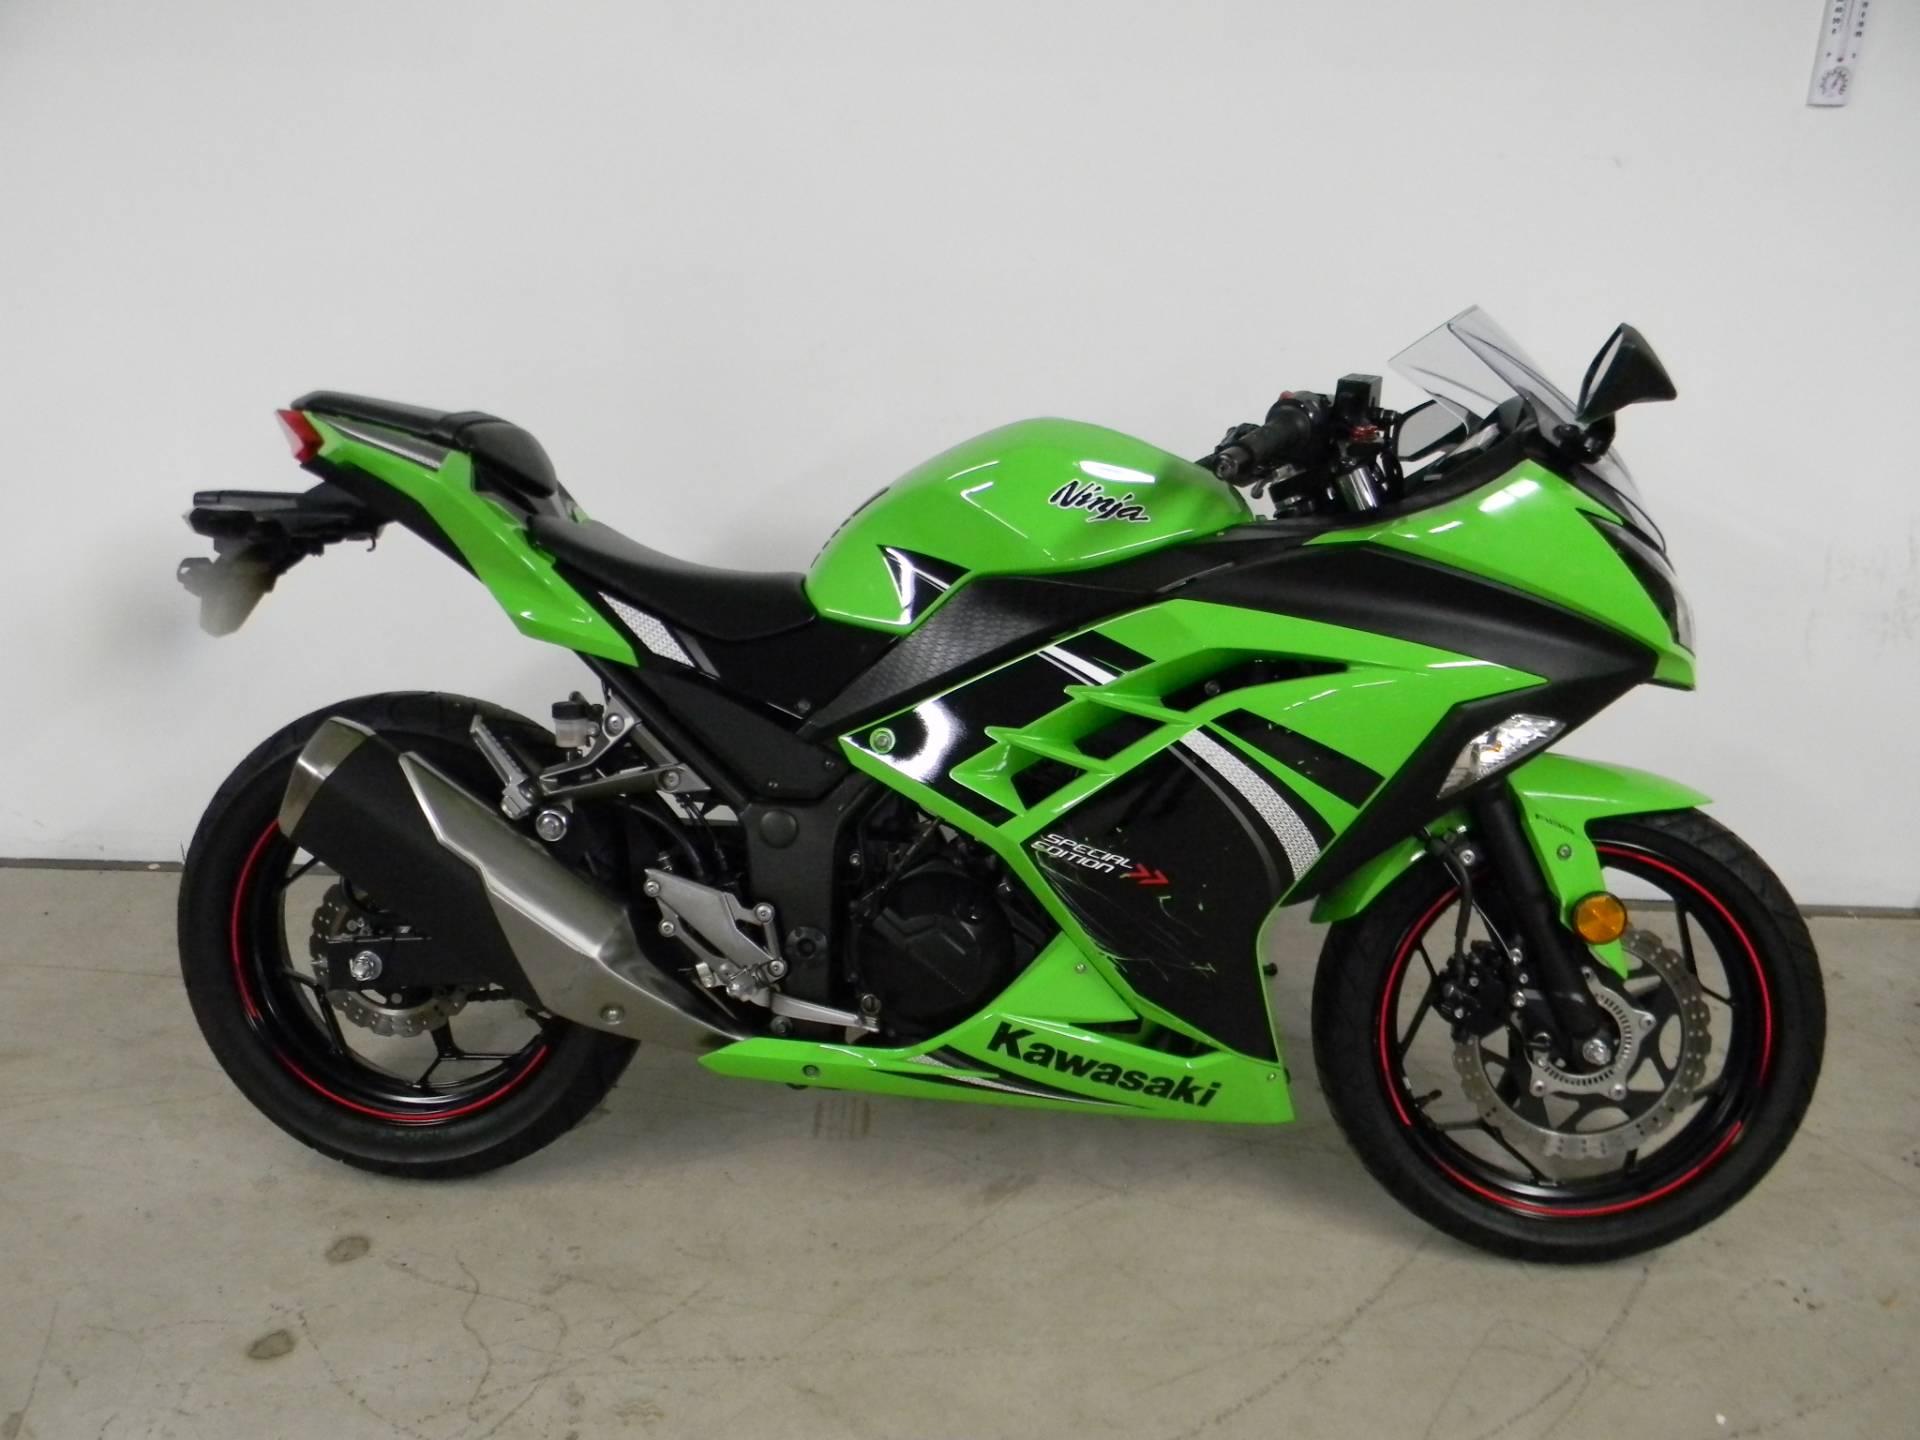 2014 Kawasaki Ninja 300 Abs Se Motorcycles Springfield